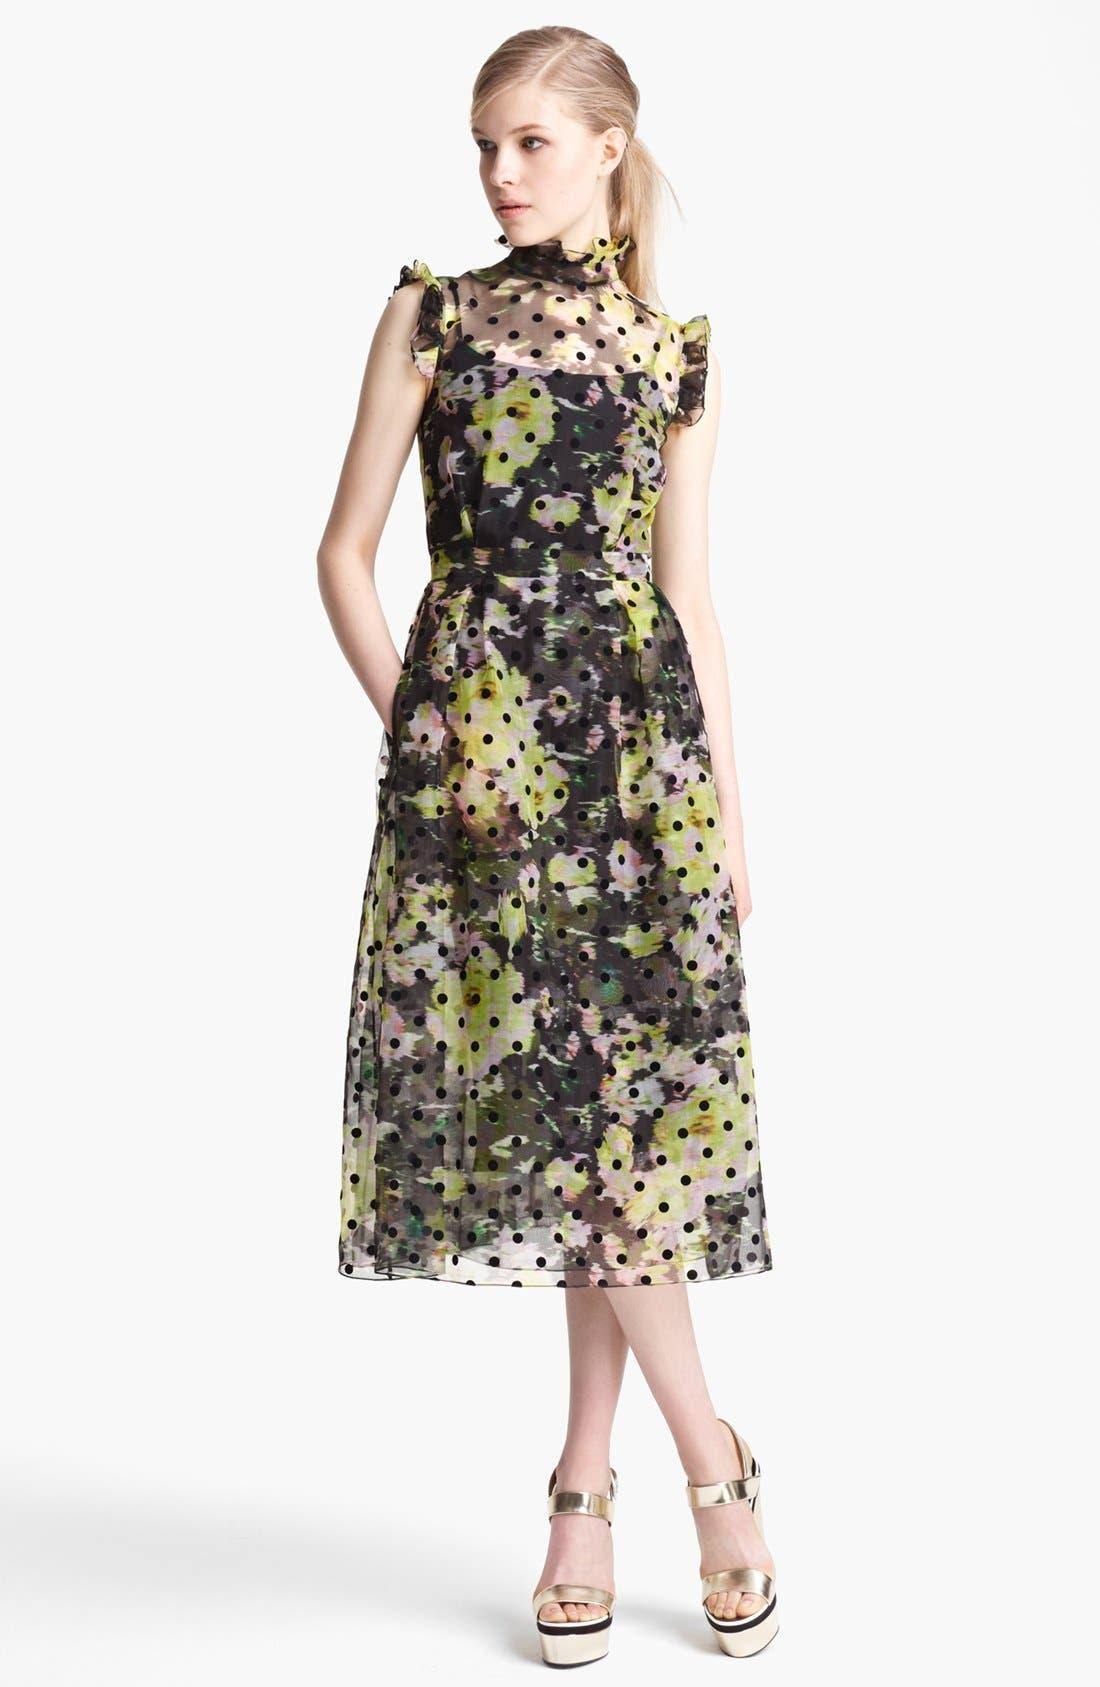 Main Image - Erdem 'Clarity' Dot Floral Print Organza Dress